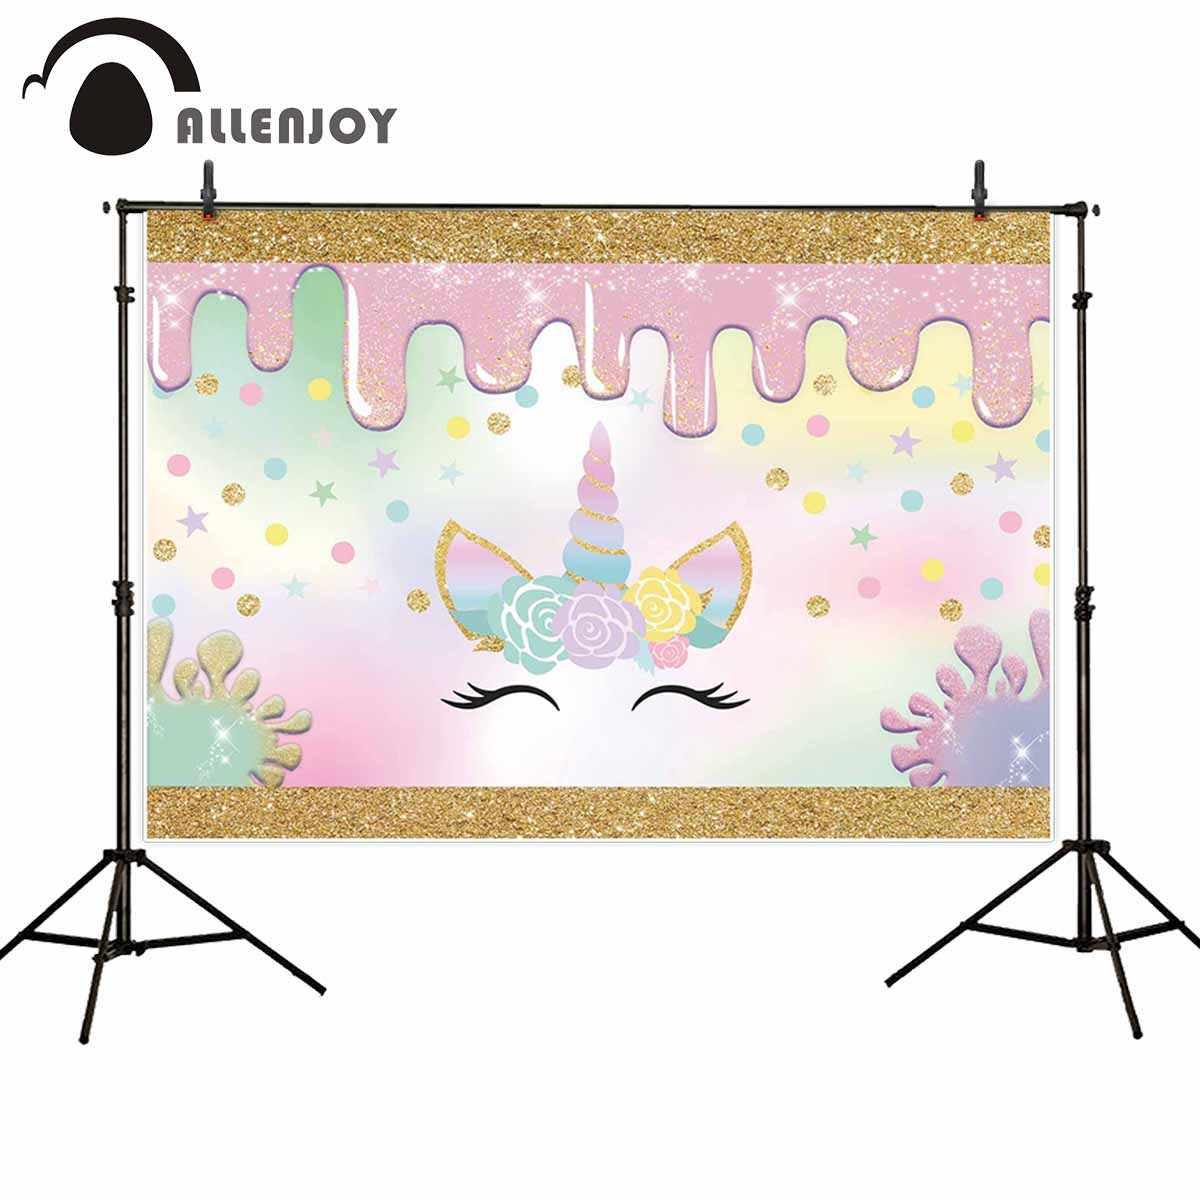 Allenjoy ユニコーンスライム写真の背景カラフルな誕生日パーティーの背景 photobooth の写真撮影の小道具パーソナライズ